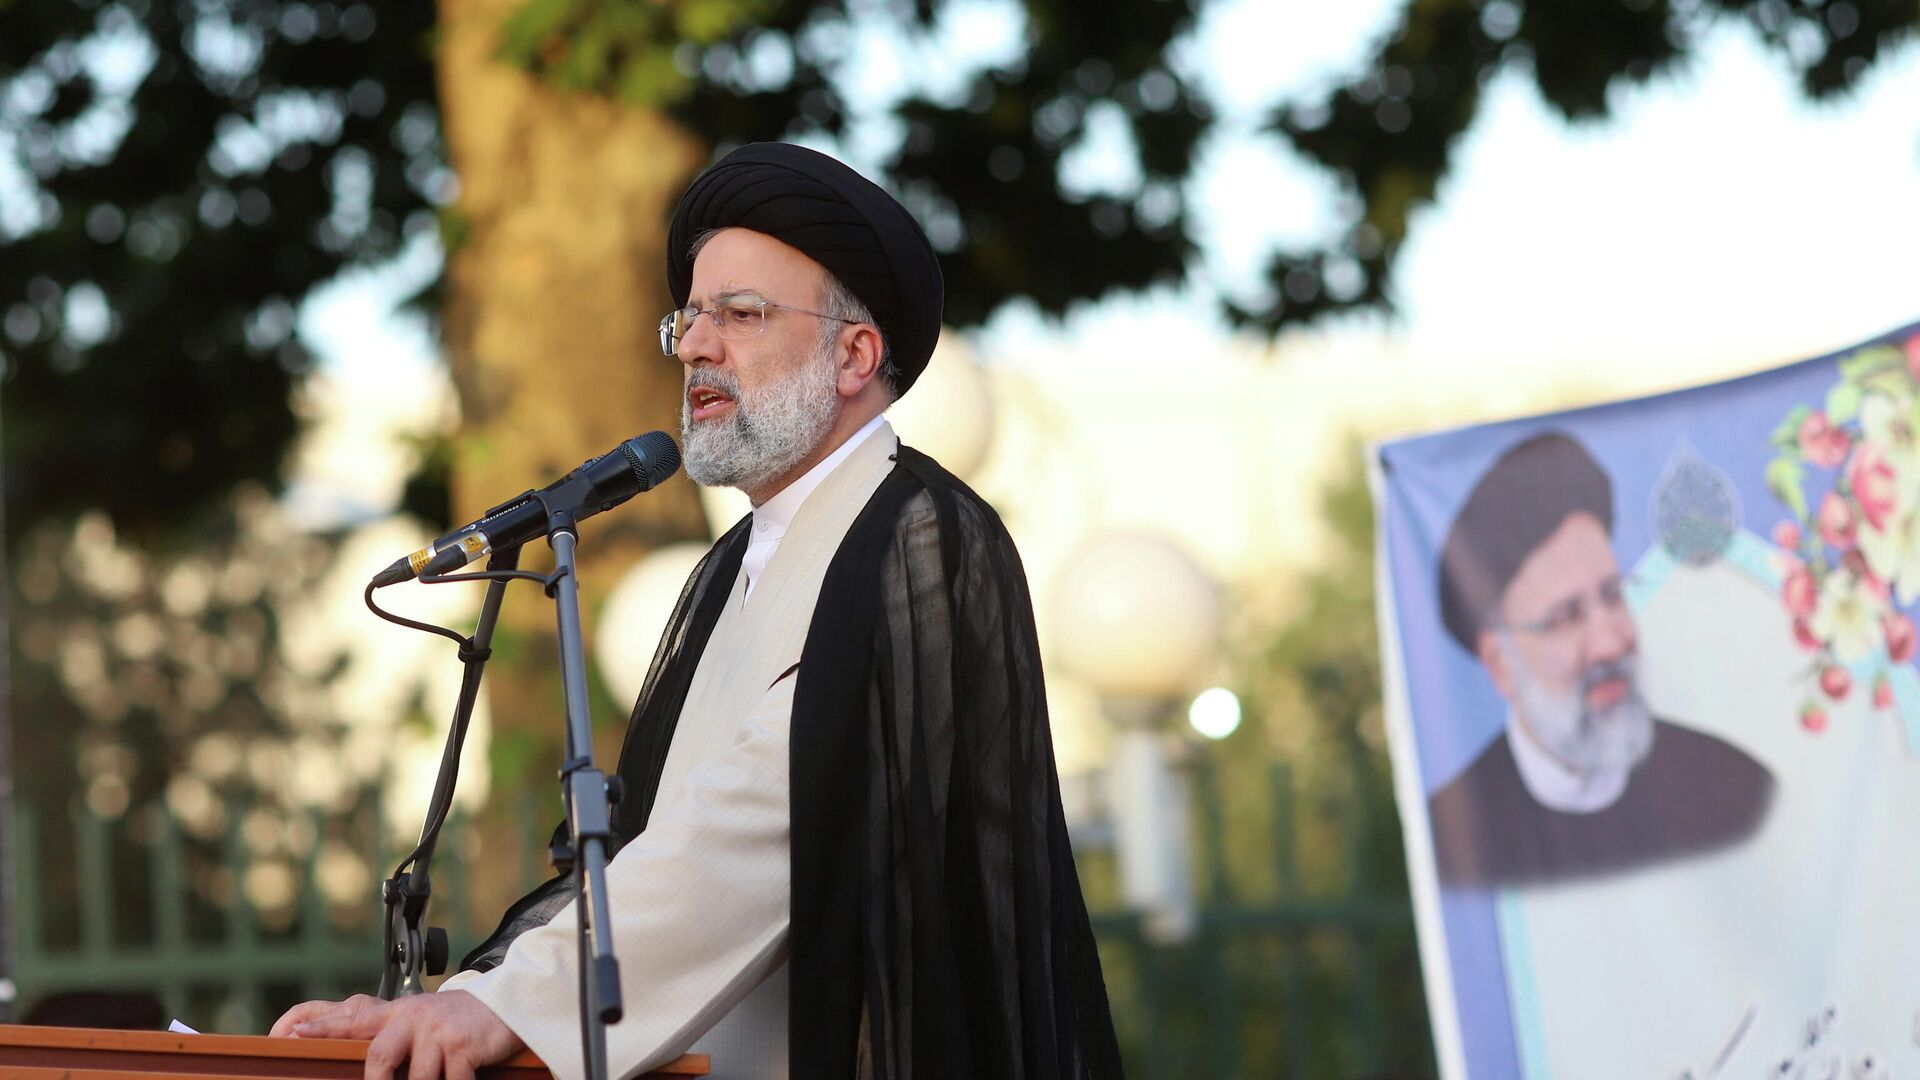 Кандидат в президенты Ирана Ибрахим Раиси во время предвыборного митинга в Тегеране - РИА Новости, 1920, 19.06.2021